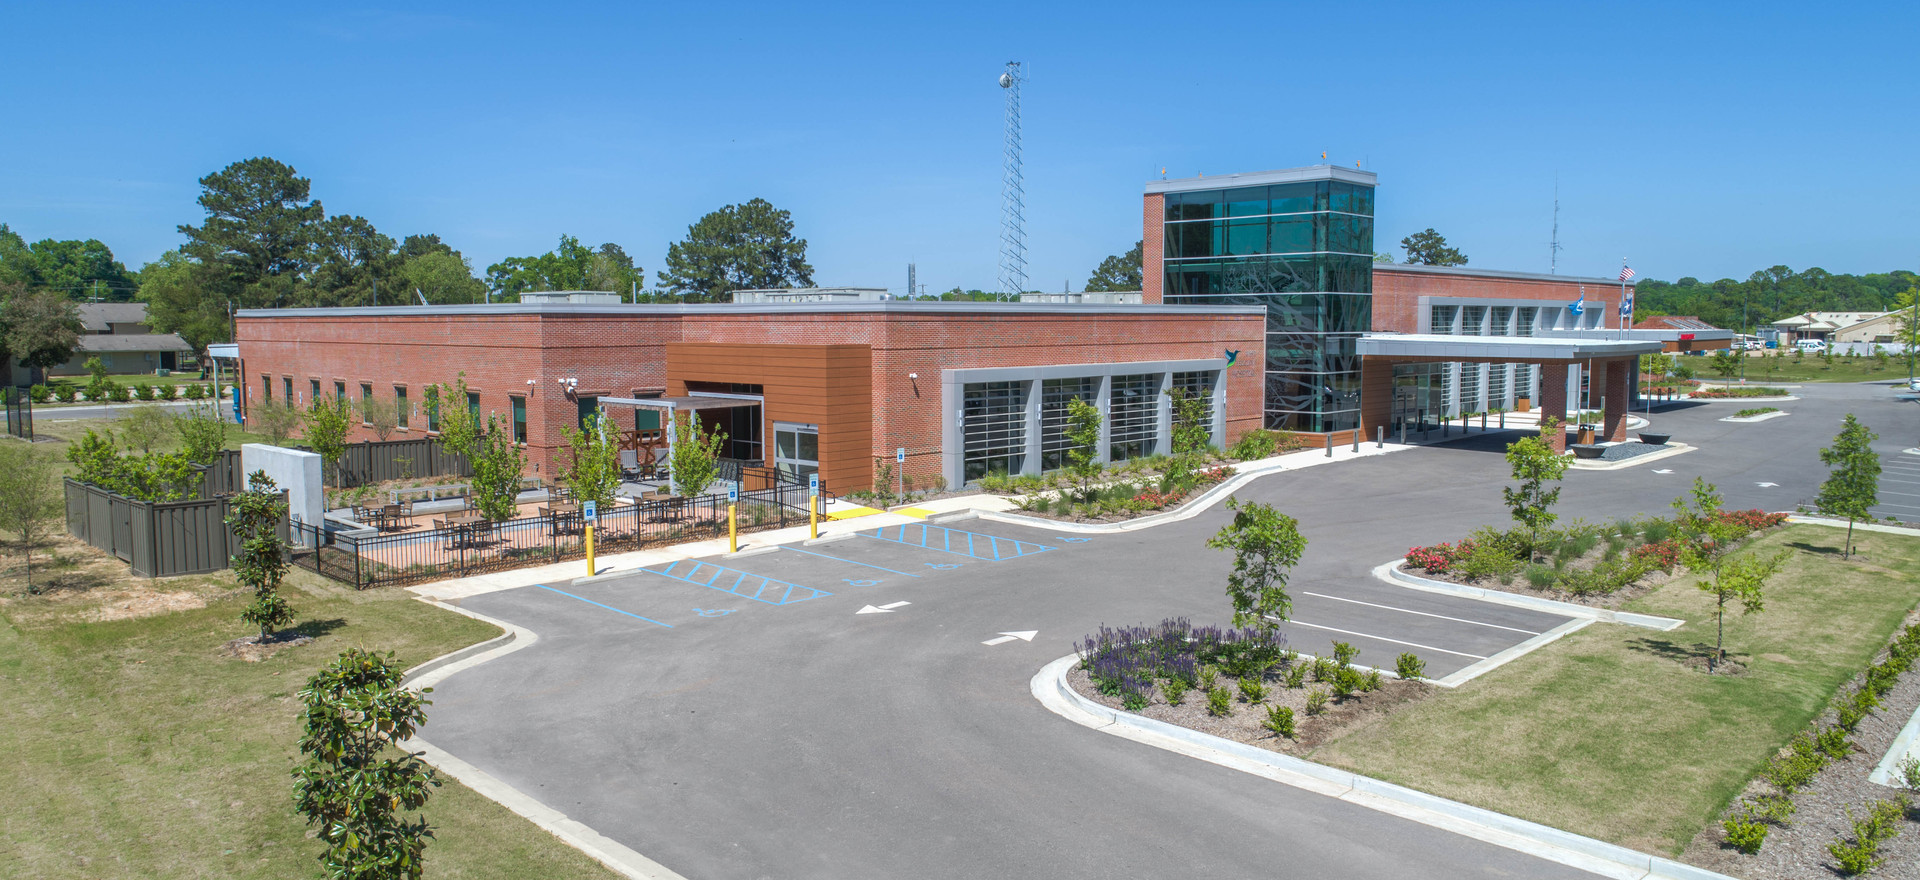 West Feliciana Parish Hospital